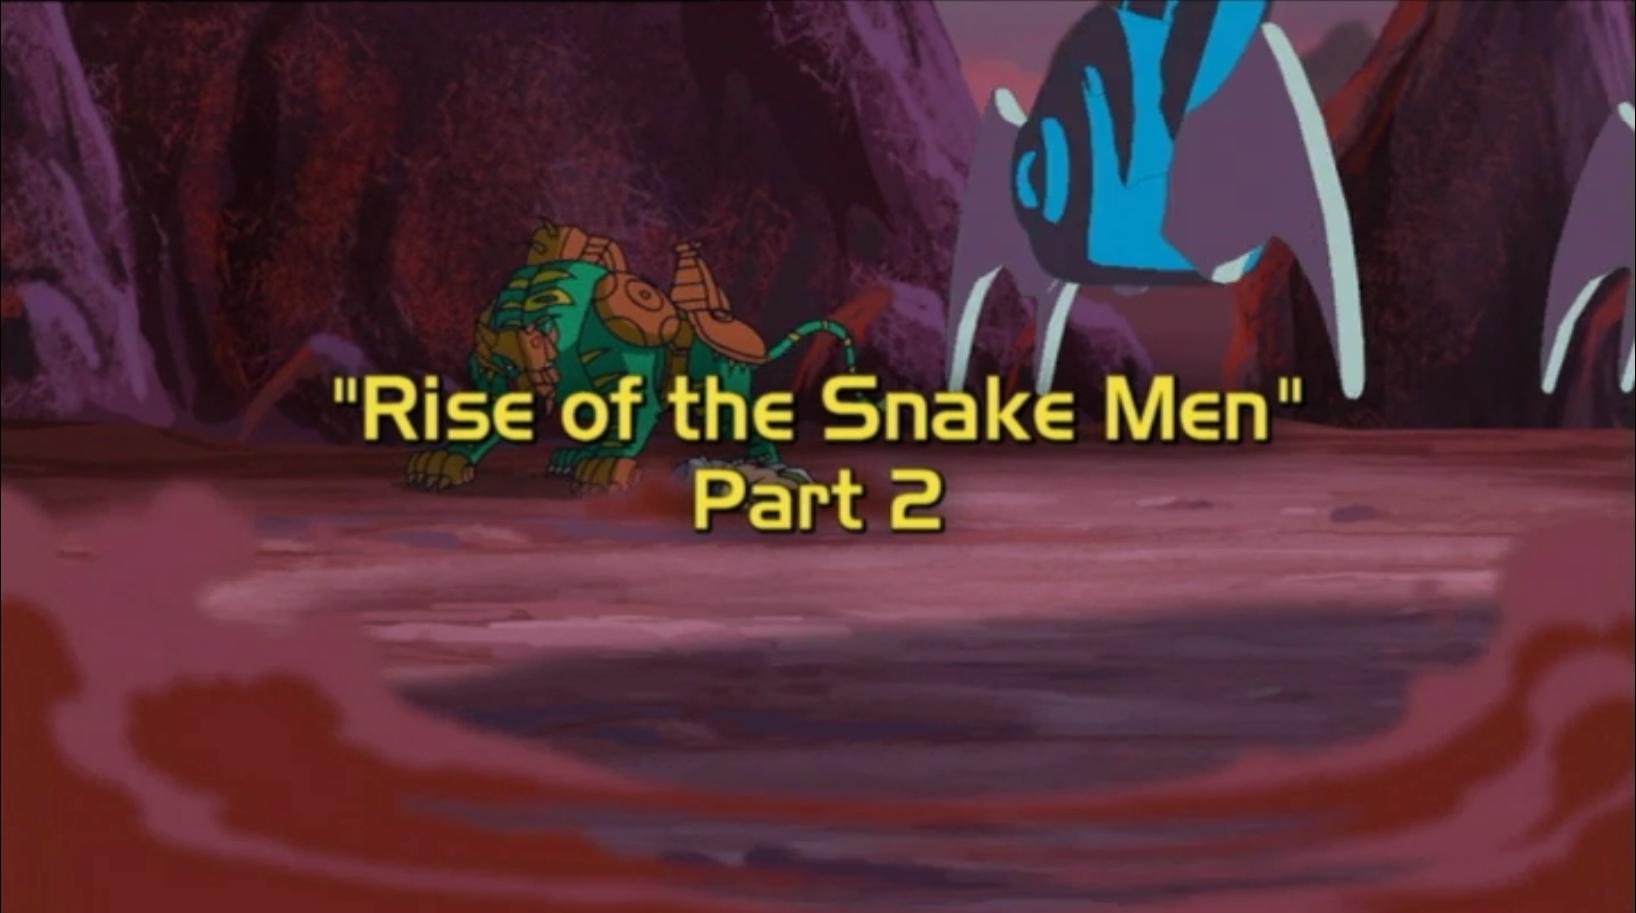 Rise of the Snake Men, Part 2